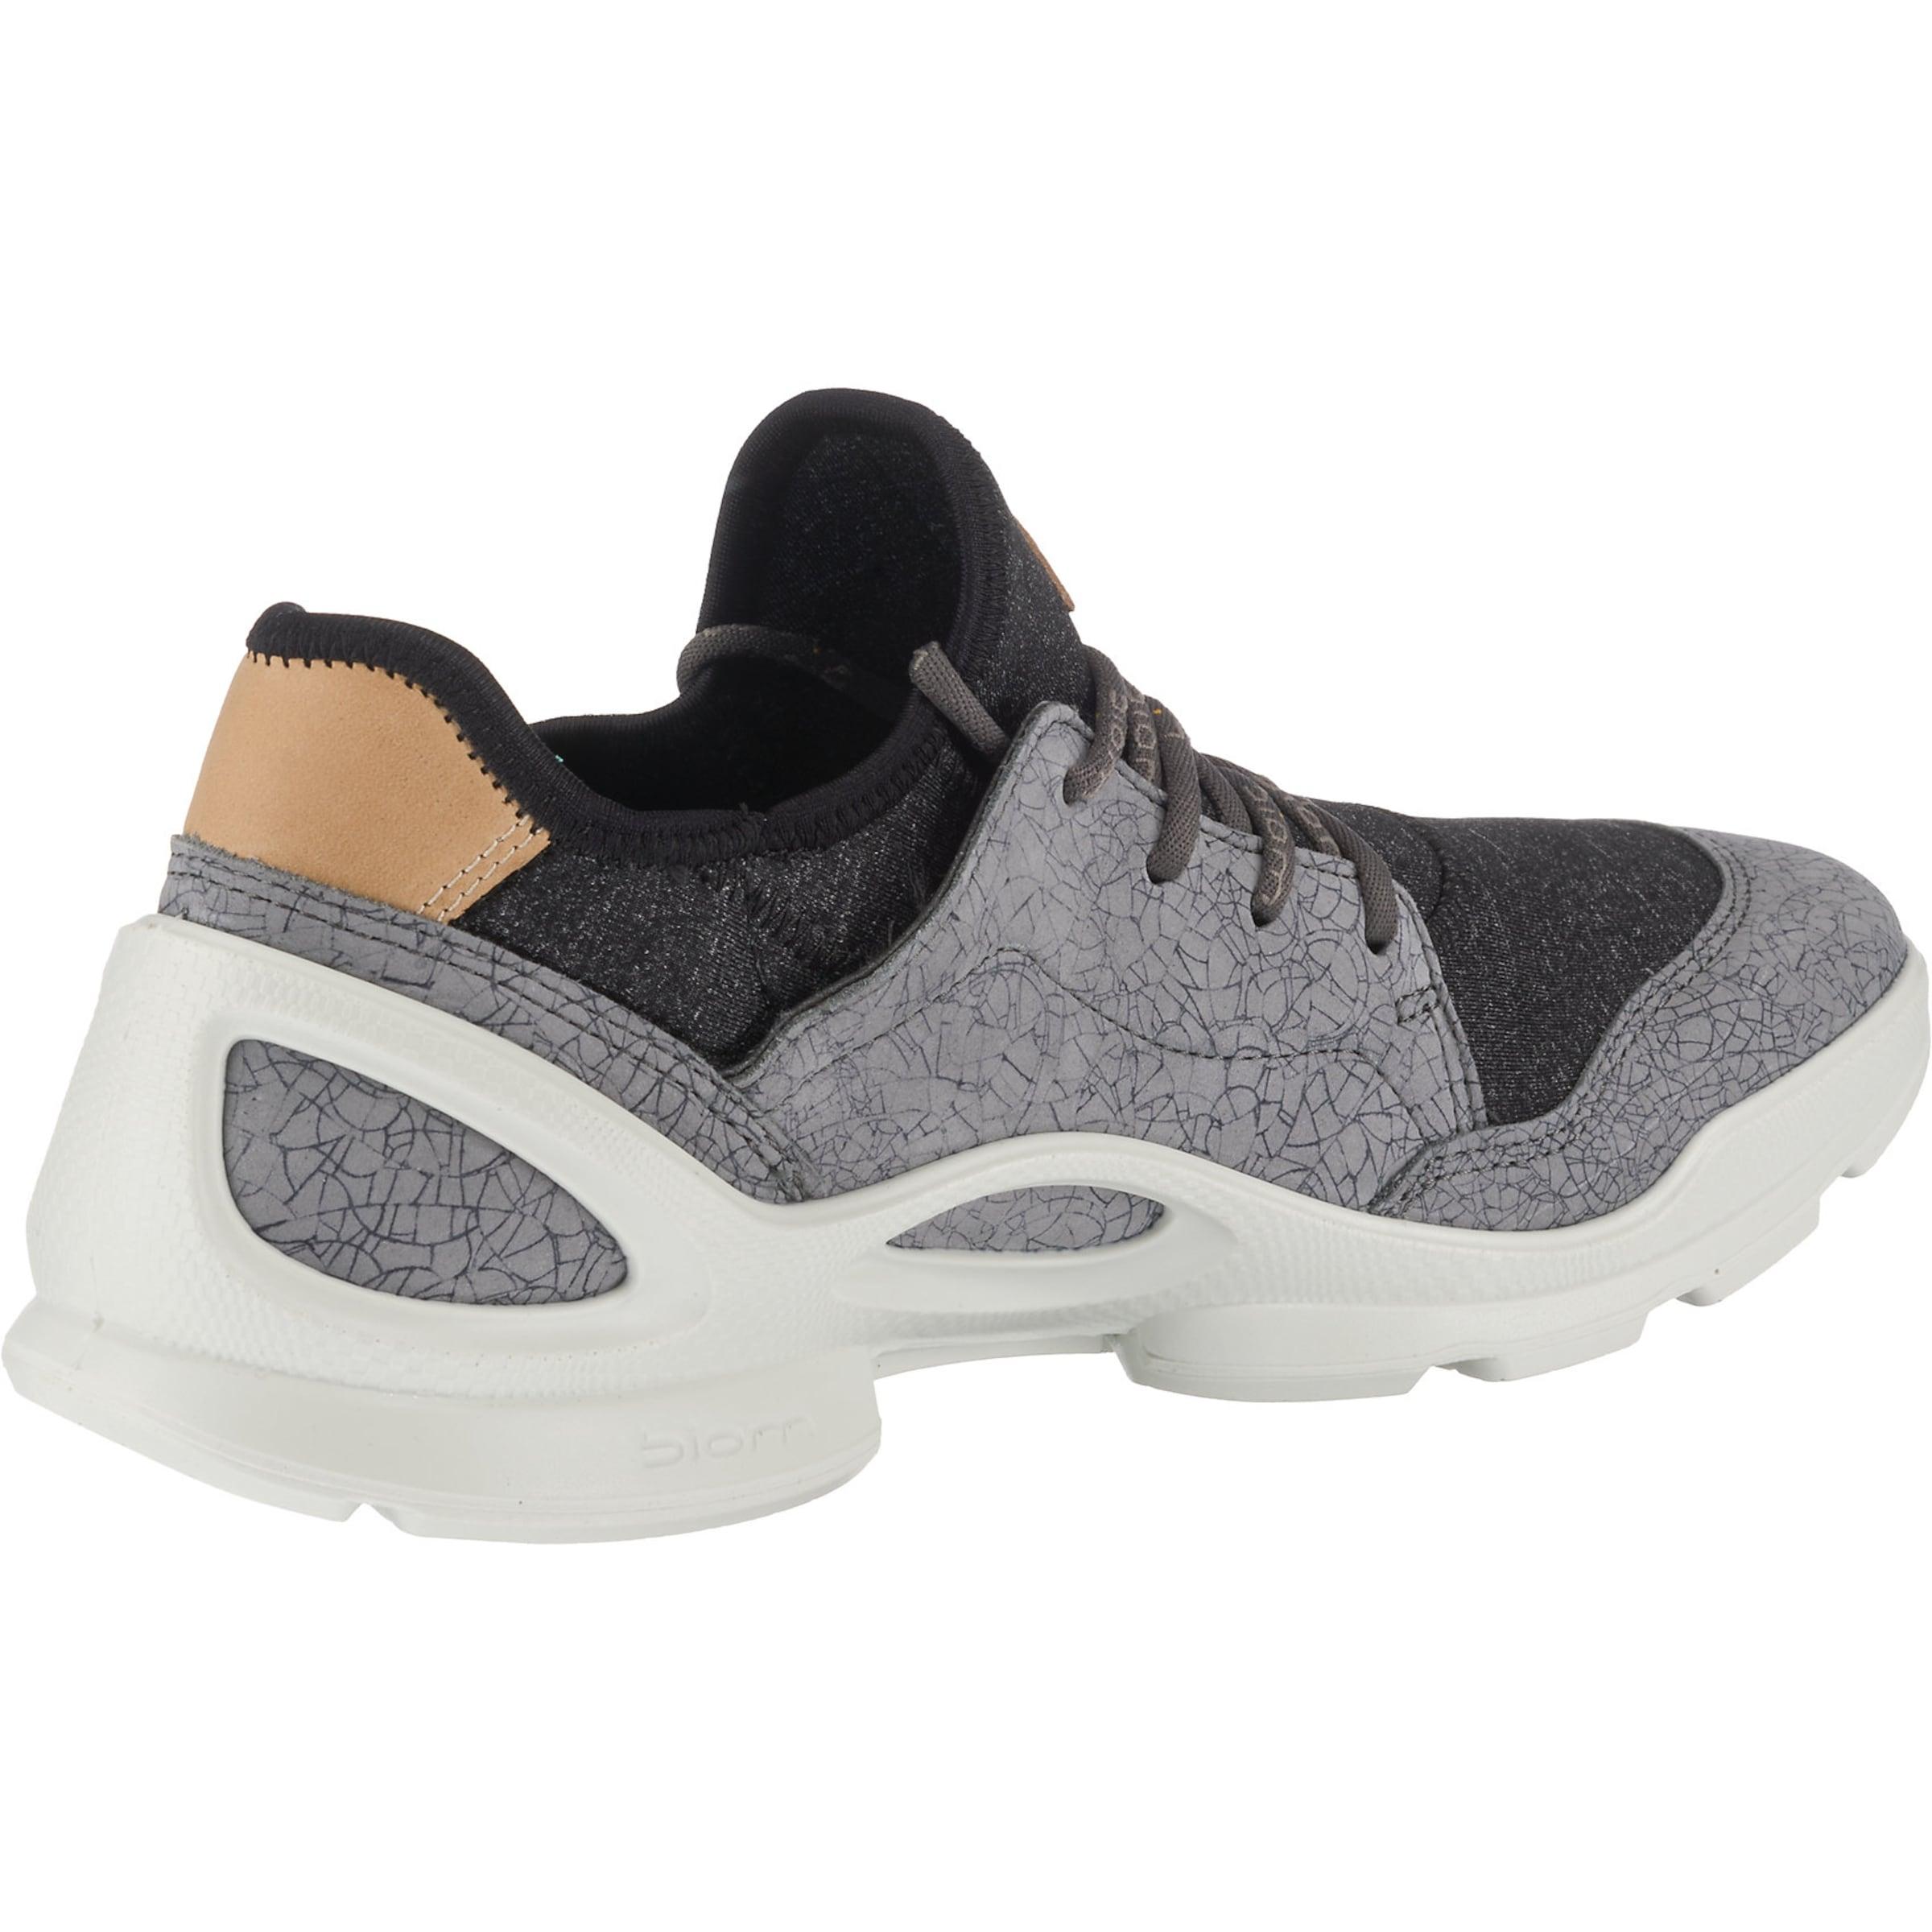 In Sneaker Sneaker Ecco Ecco AnthrazitSilbergrau Sneaker Ecco Sneaker Ecco AnthrazitSilbergrau In In AnthrazitSilbergrau xCrdWBeo